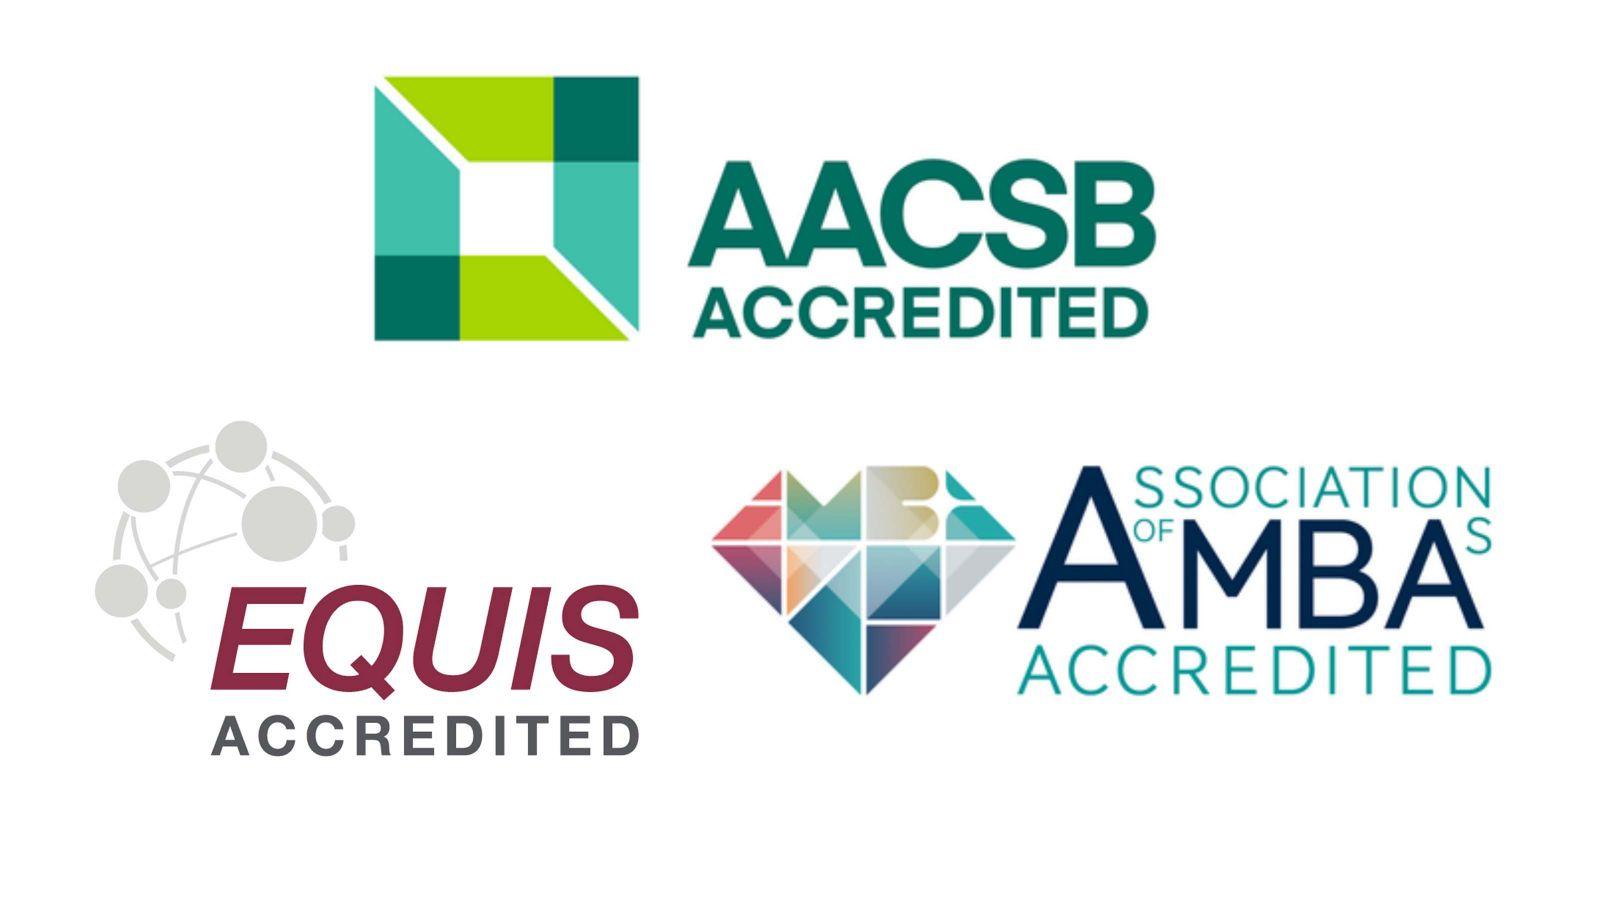 Logos - AACSB, EQUIS, AMBA.